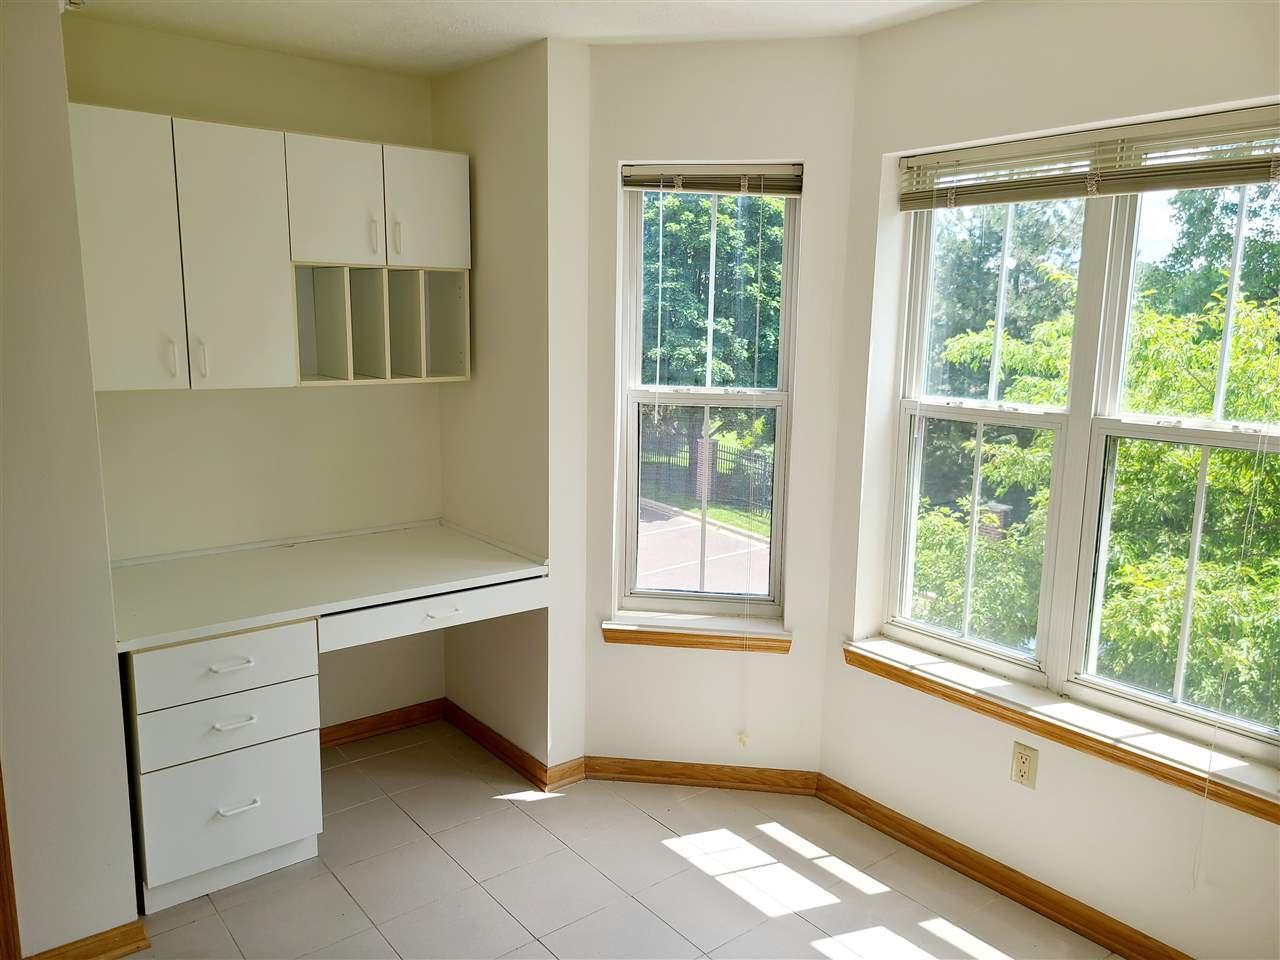 8530 Greenway Blvd, Middleton, Wisconsin 53562, 1 Bedroom Bedrooms, ,1 BathroomBathrooms,Condominium,For Sale,8530 Greenway Blvd,1903058